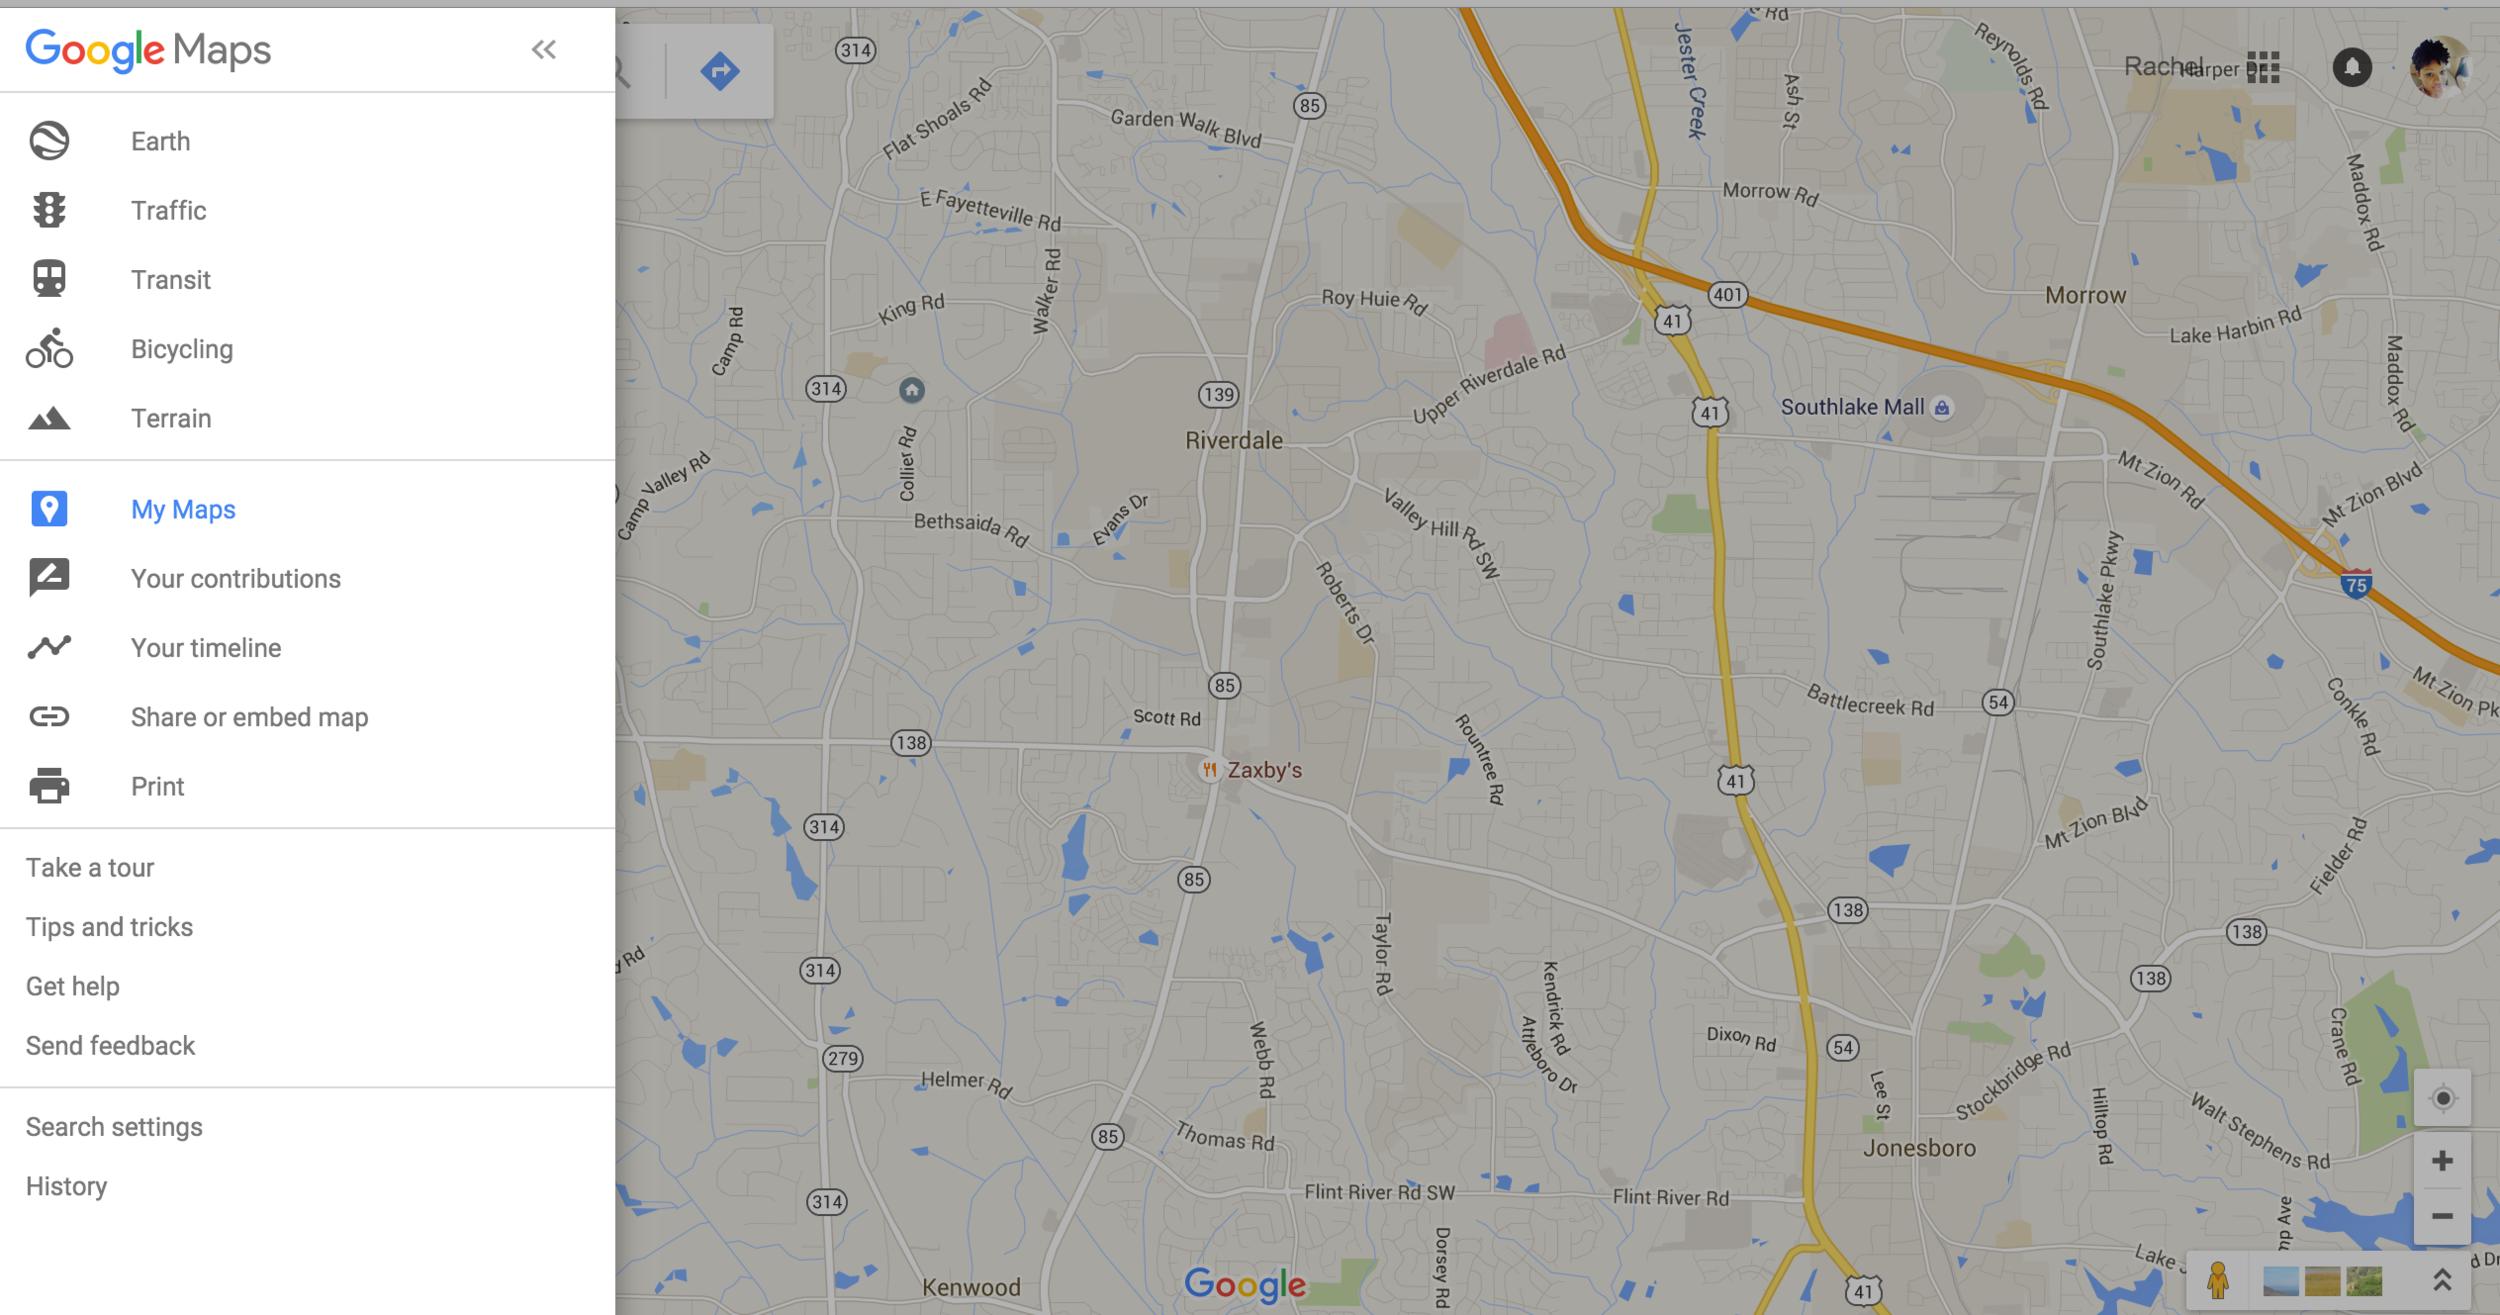 Rachel Travels - Google Maps - Navigate to Google Maps